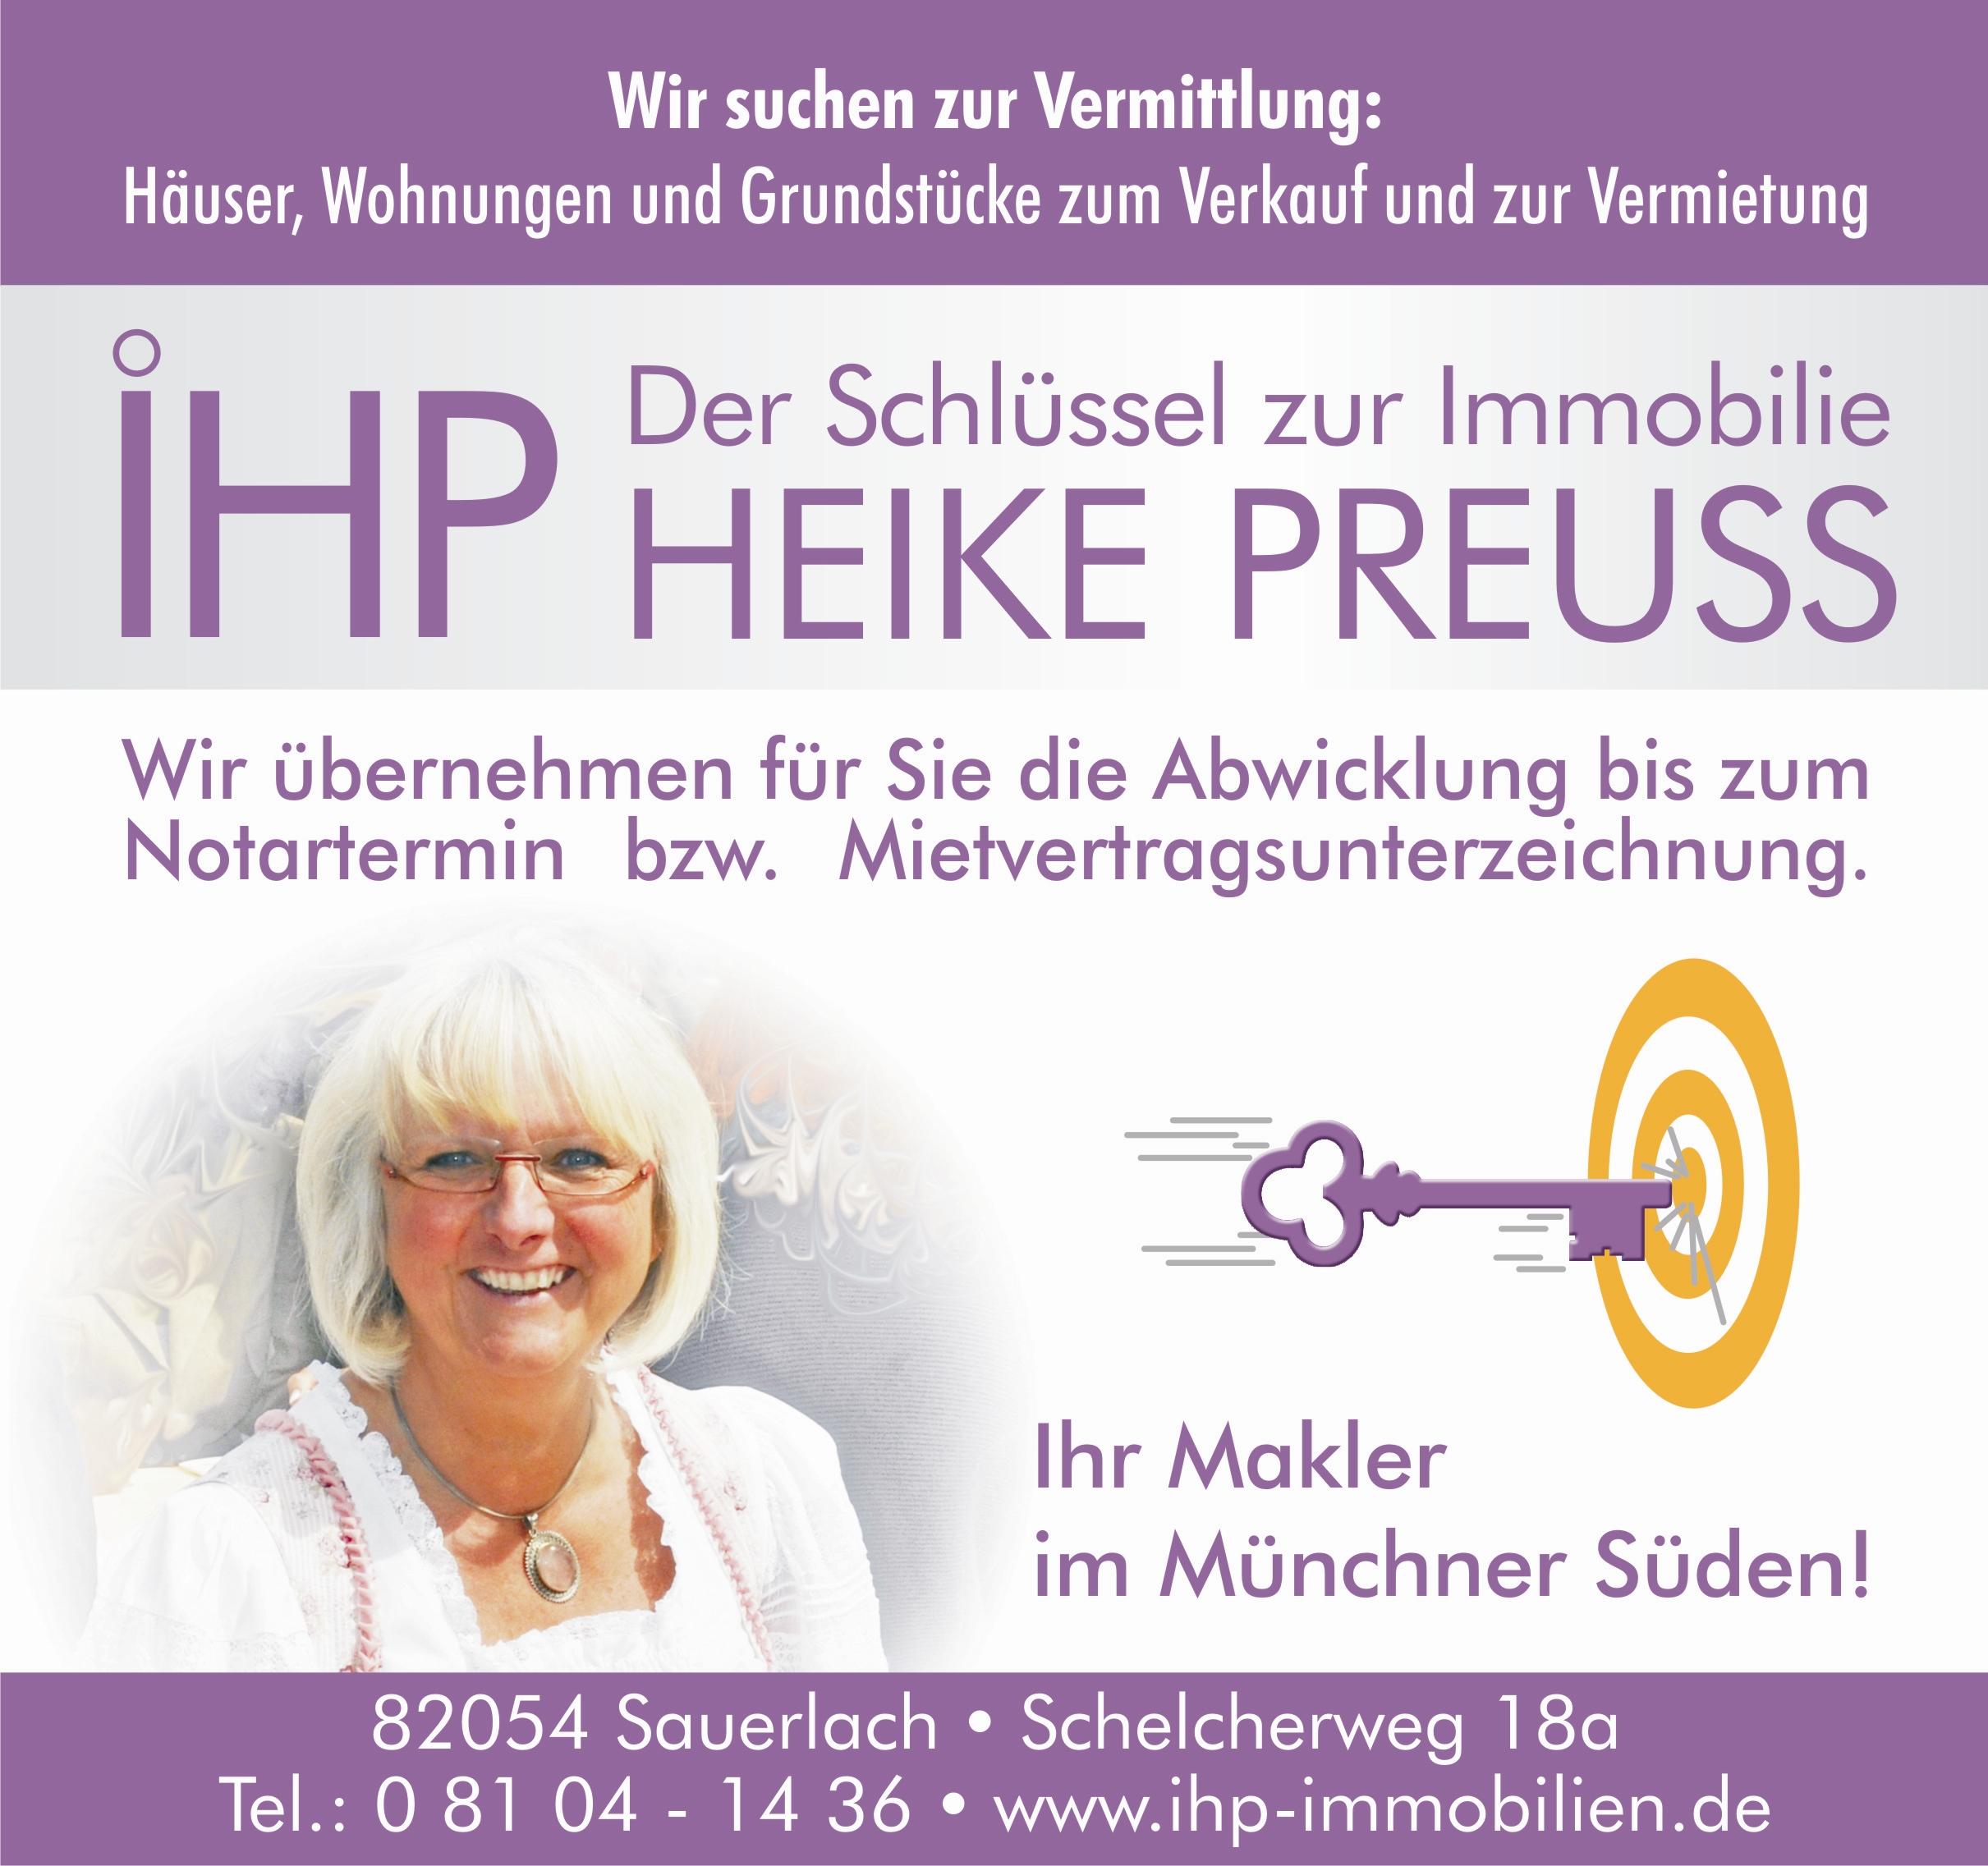 IHP-Immobilien Heike Preuss